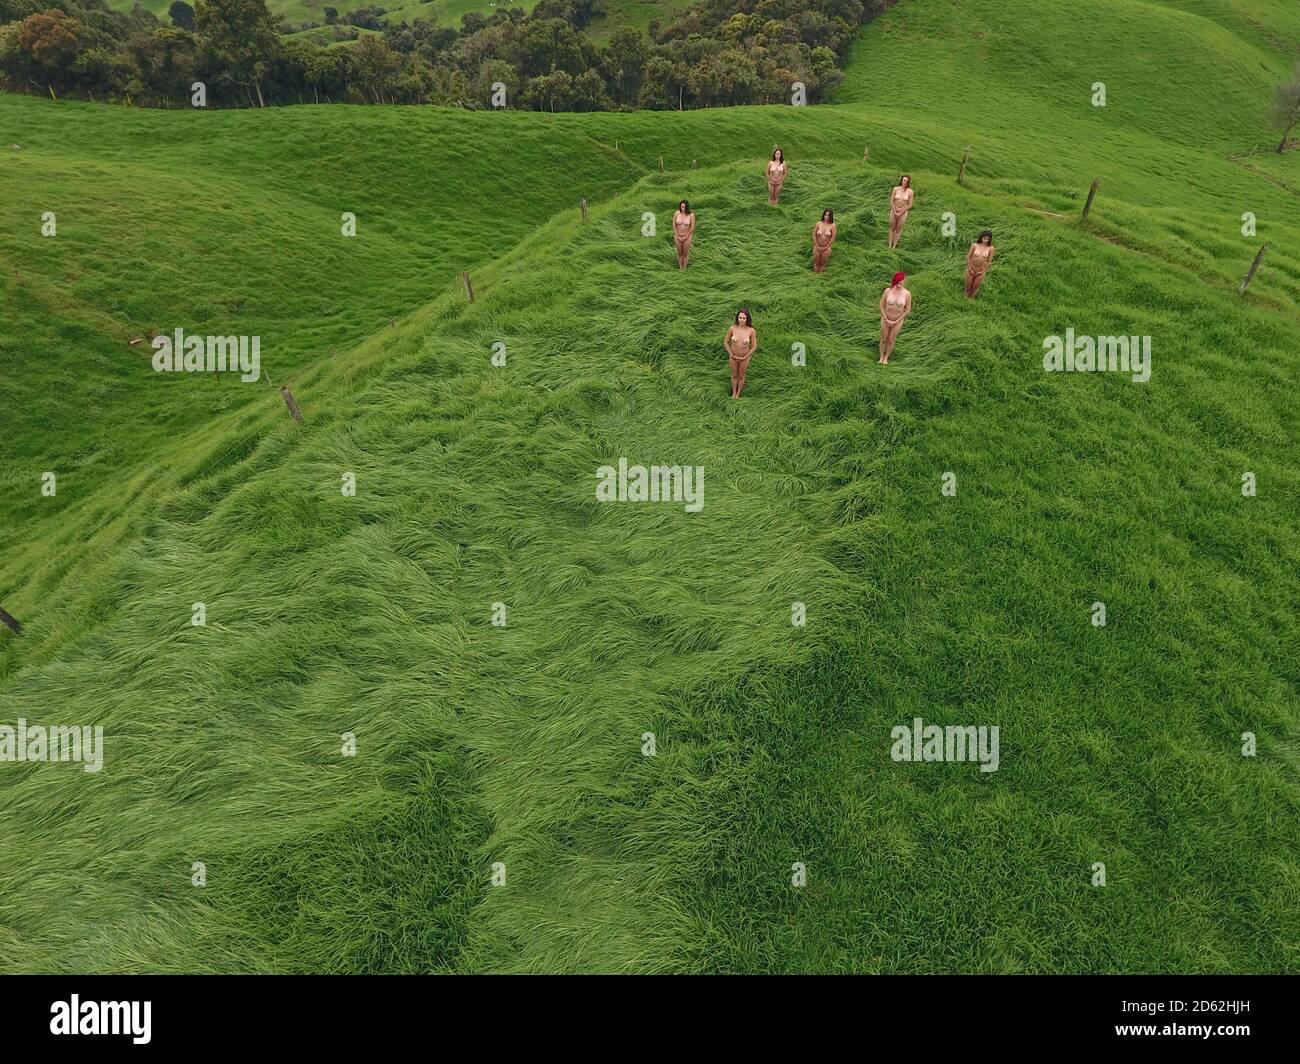 Vista aérea de un grupo de mujeres que meditan en la naturaleza. Foto de stock